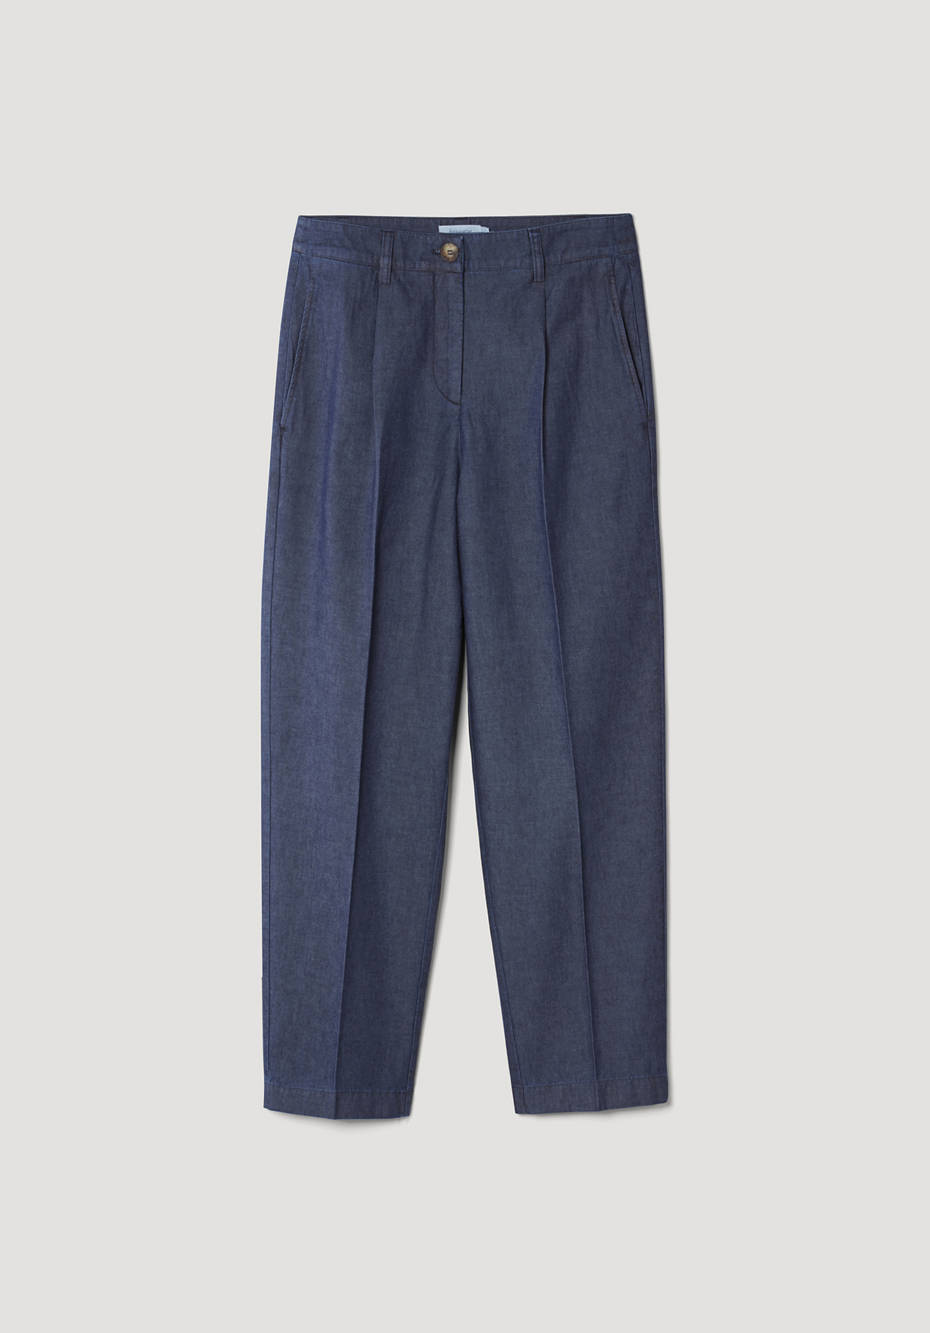 Pure organic cotton jeans